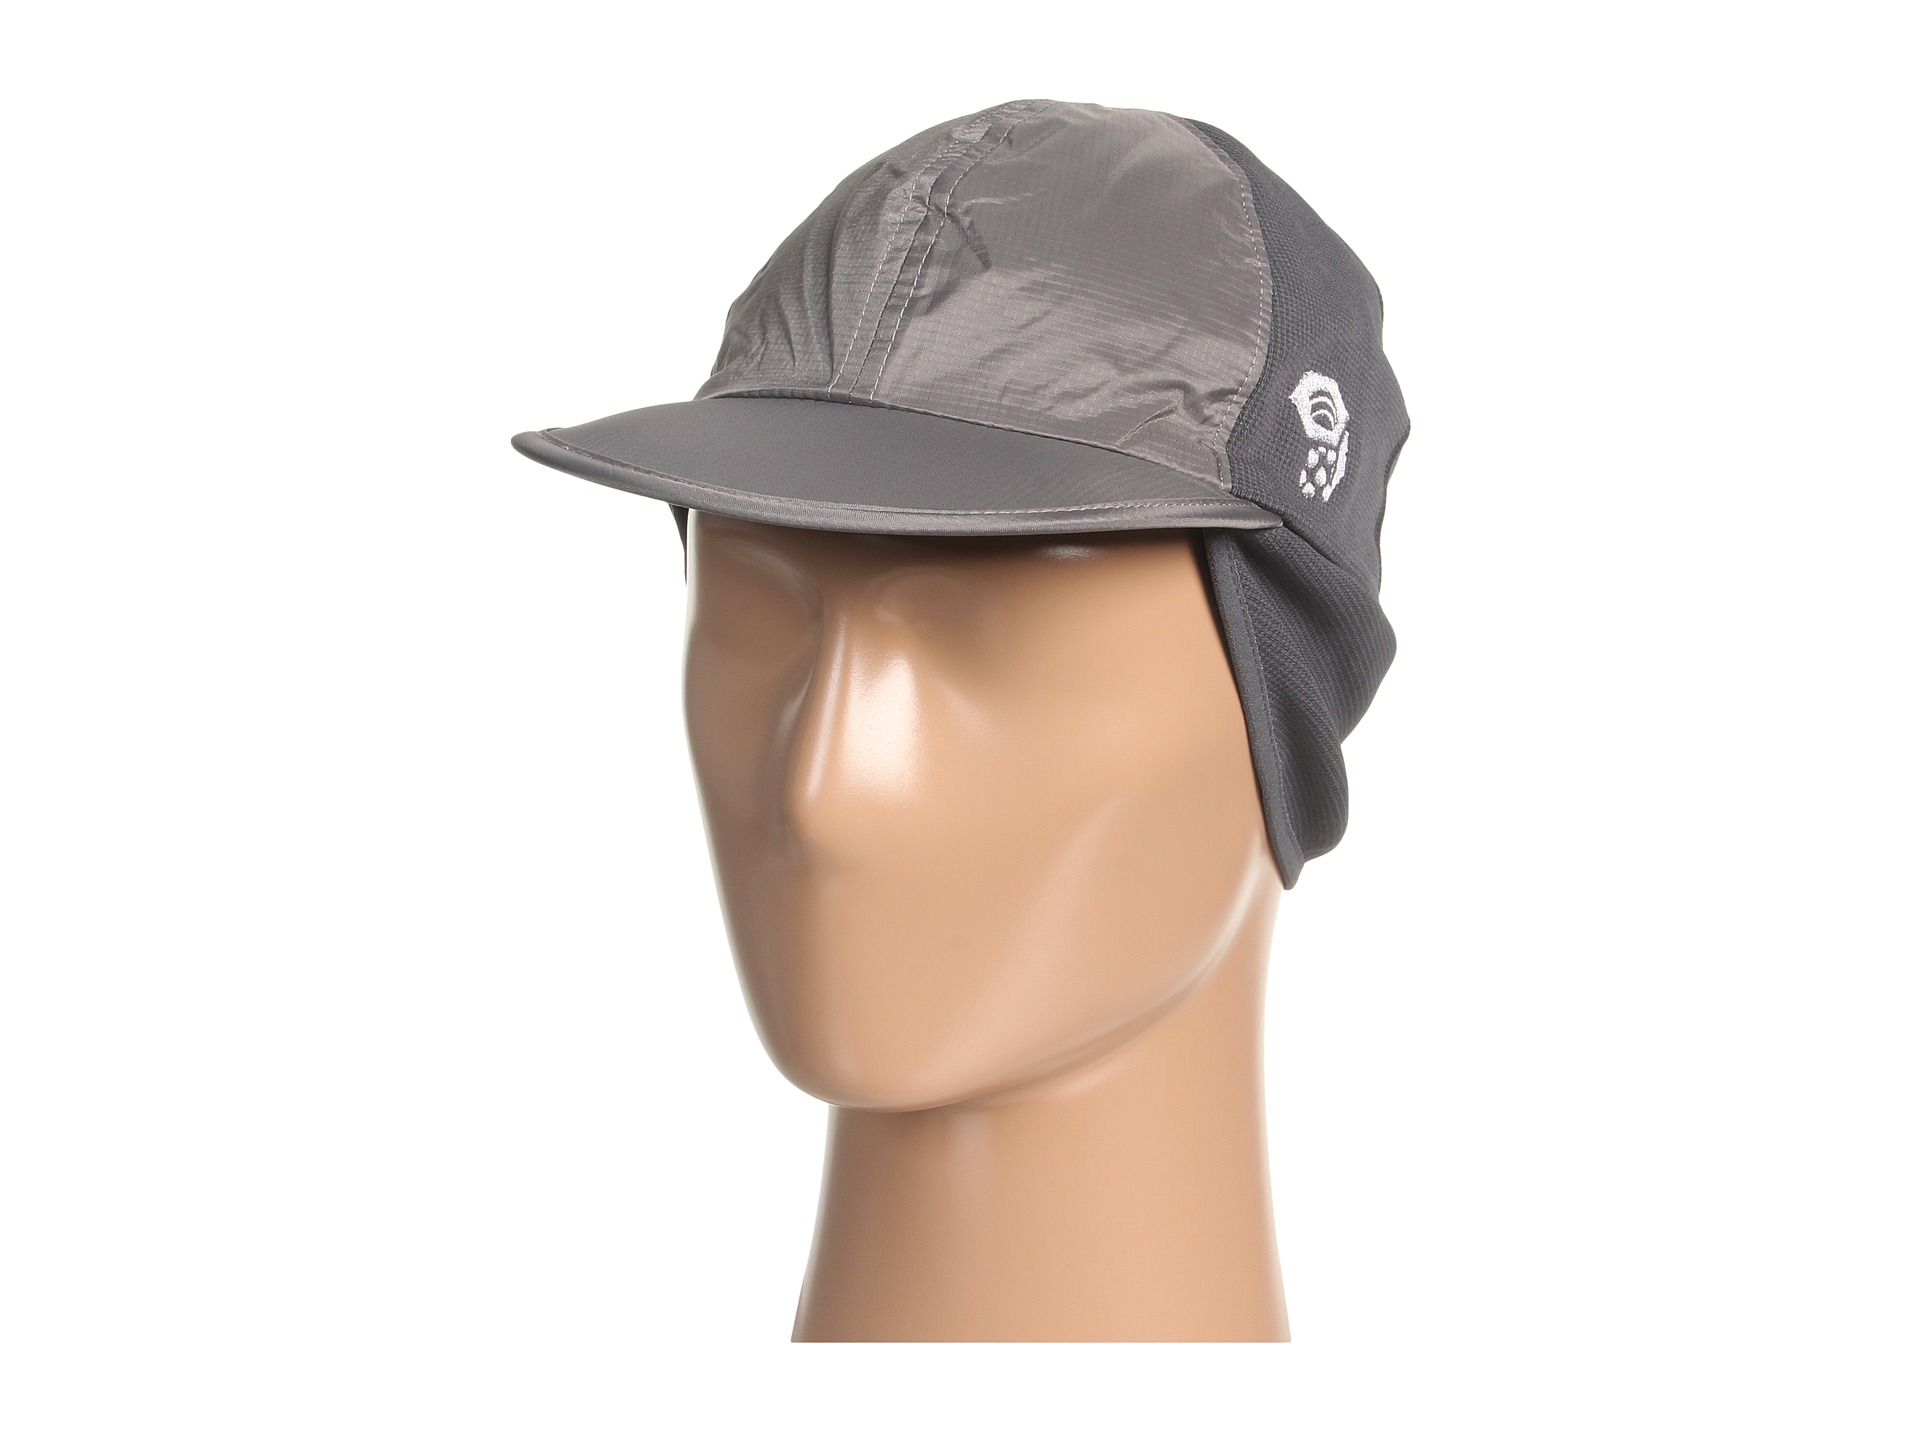 Mountain Hardwear Alpine Ascent Ball Cap  31.99  35.00 SALE on PopScreen 8e3d0b896361